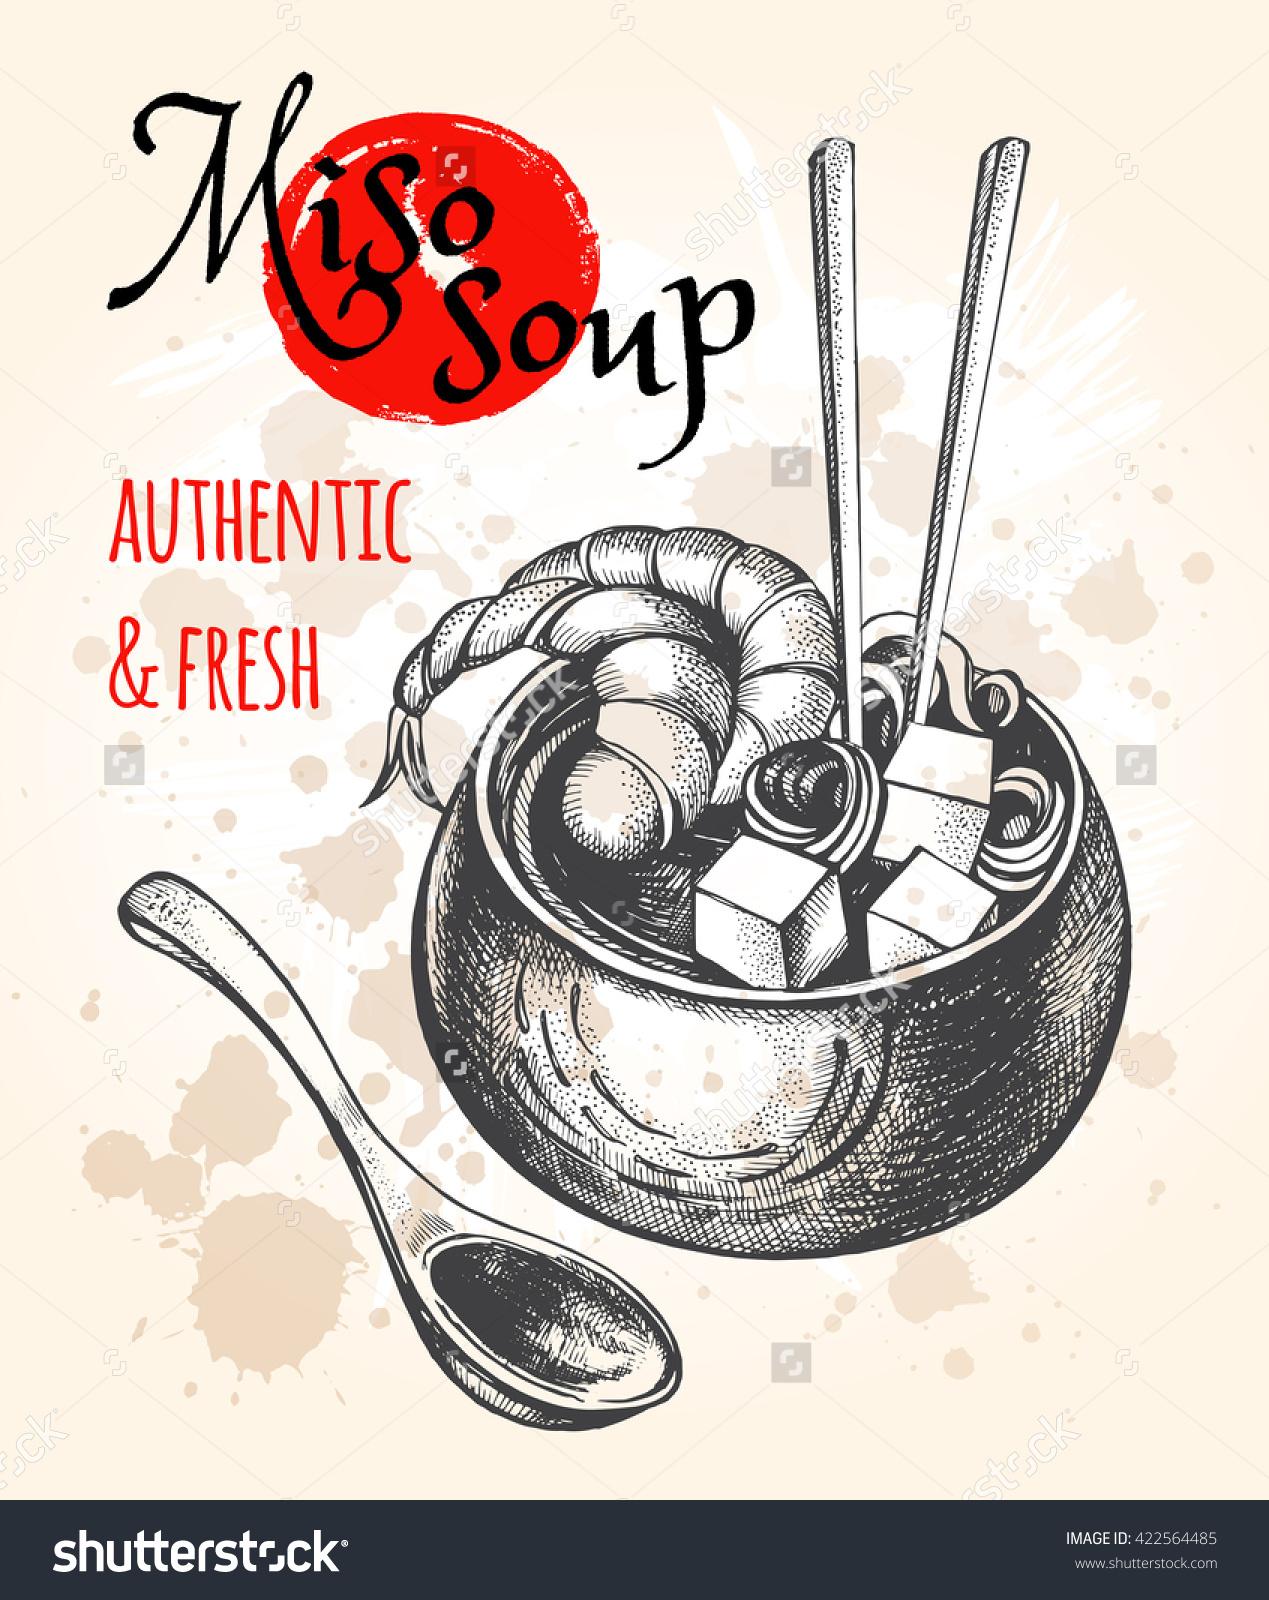 Japanese Cuisine Soup Miso. Vector Hand Drawn Illustration. Menu.